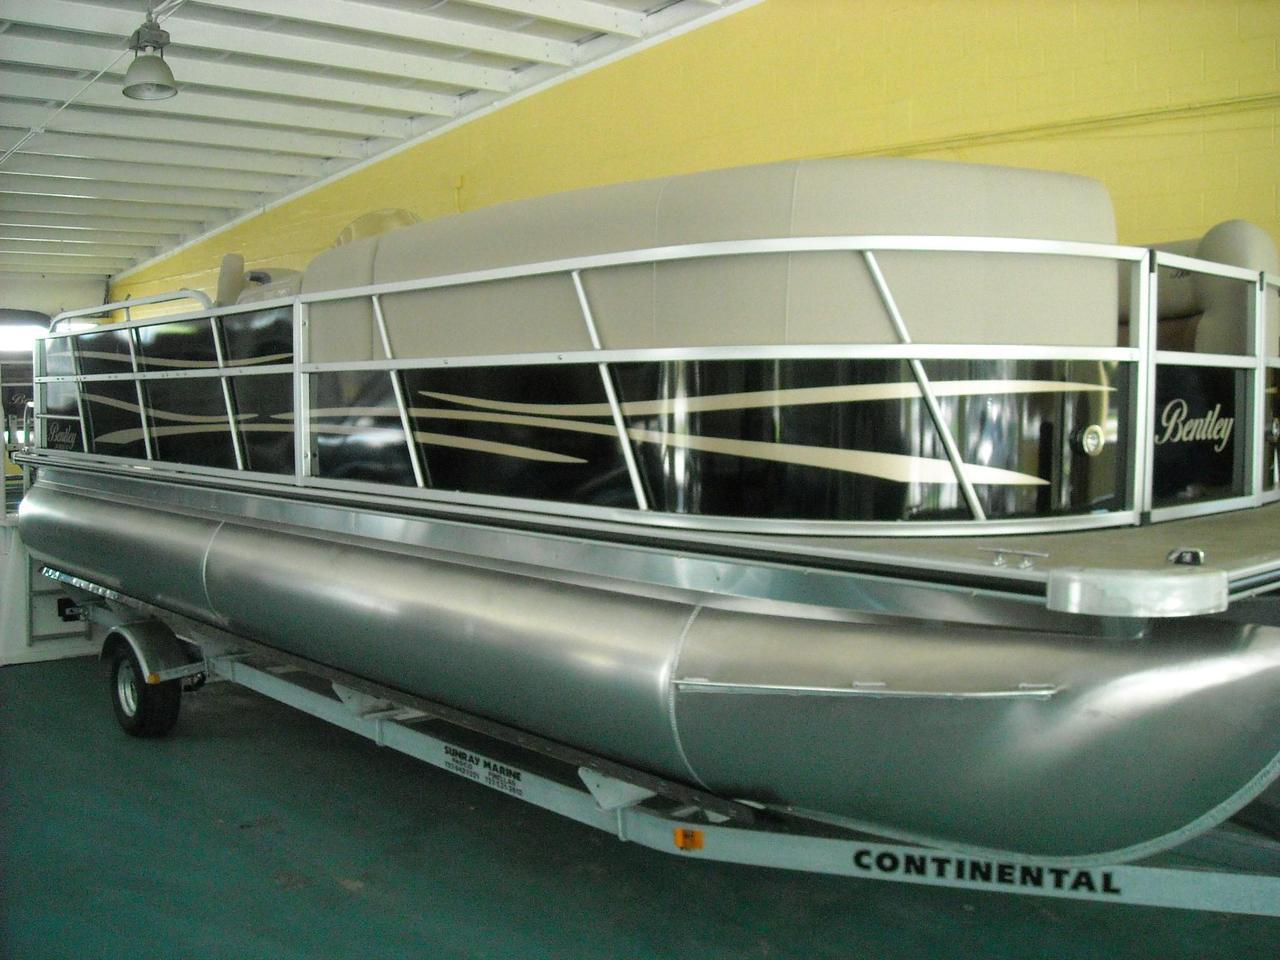 fl sailo beach motor sale pontoon all for rental view north boat boats bentley miami